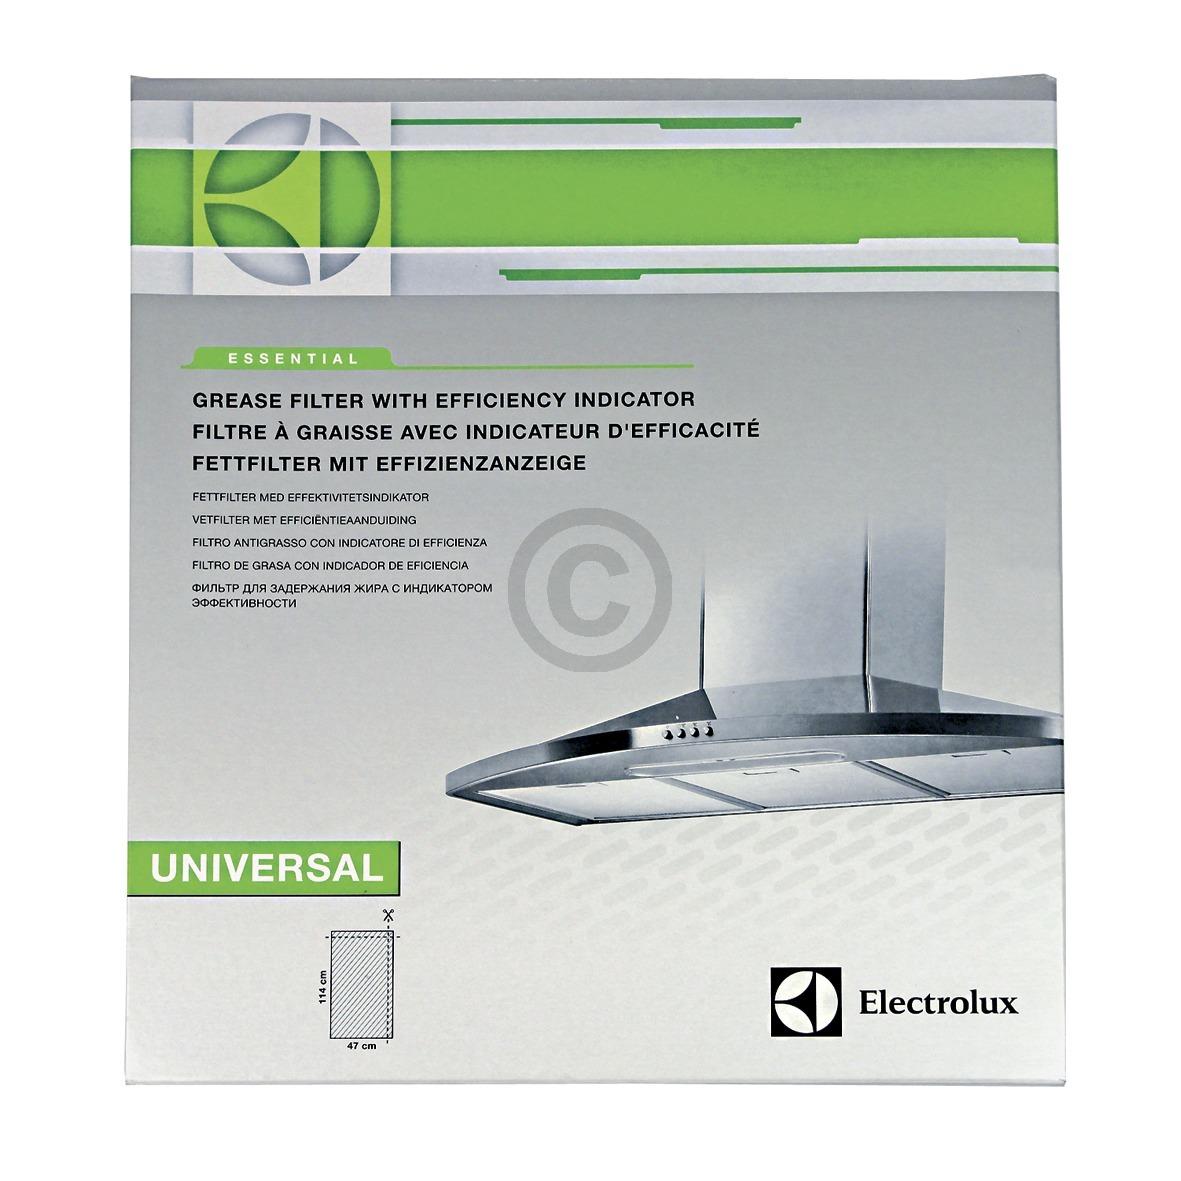 Fettfiltermatte 570x470mm Electrolux, 2 Stück, Universal! 902979217 AEG, Electro